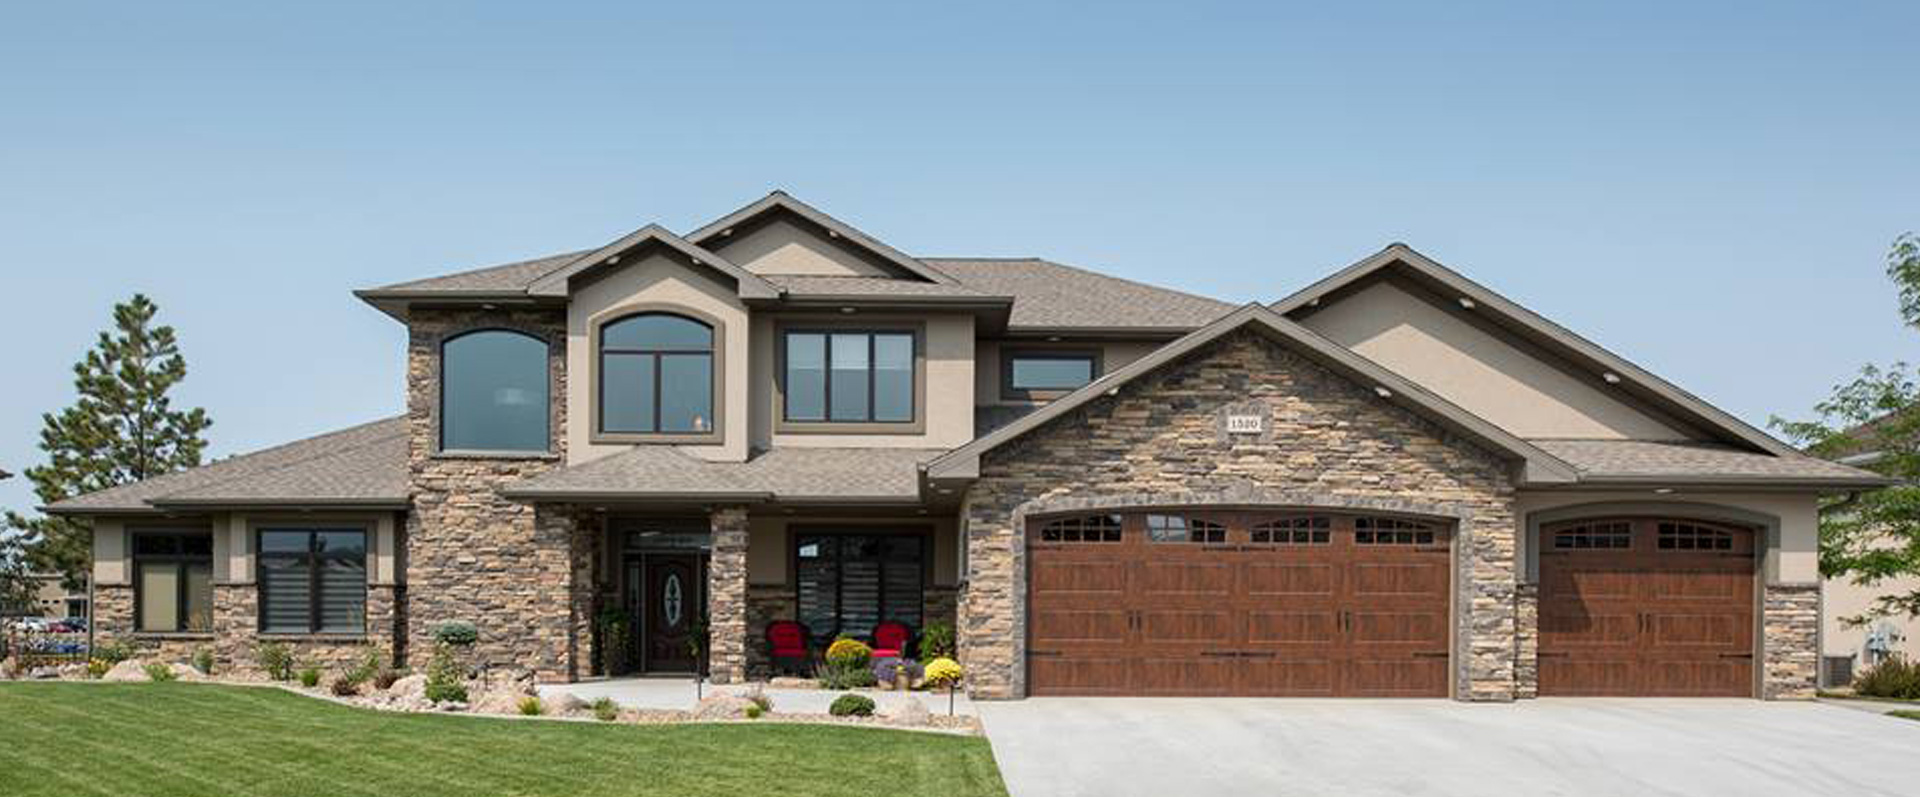 Custom home builder bismarck nd k l homes inc for Nd home builders